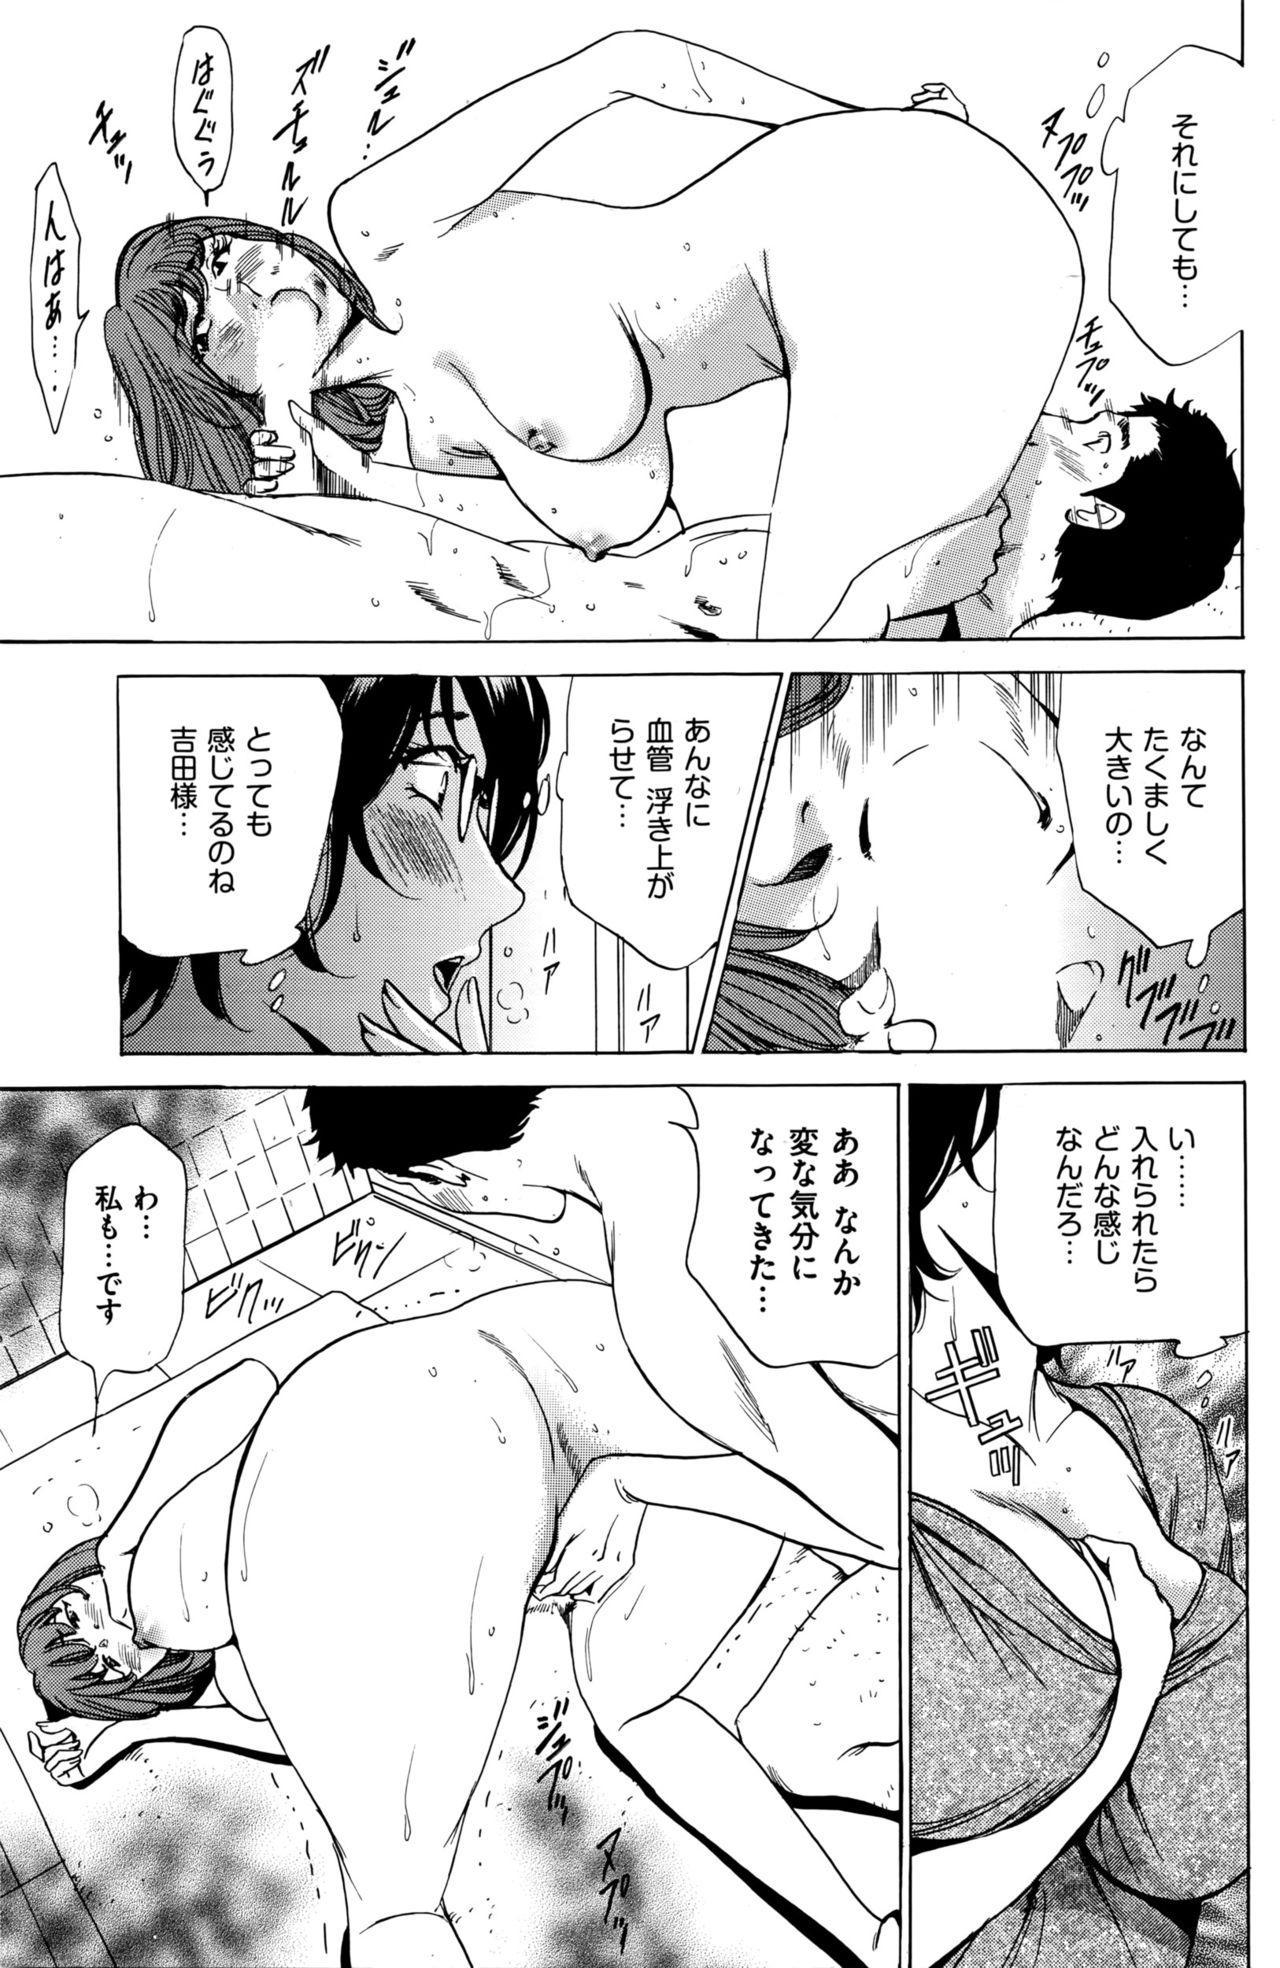 Wa Usuki Ipa a 1-10 49